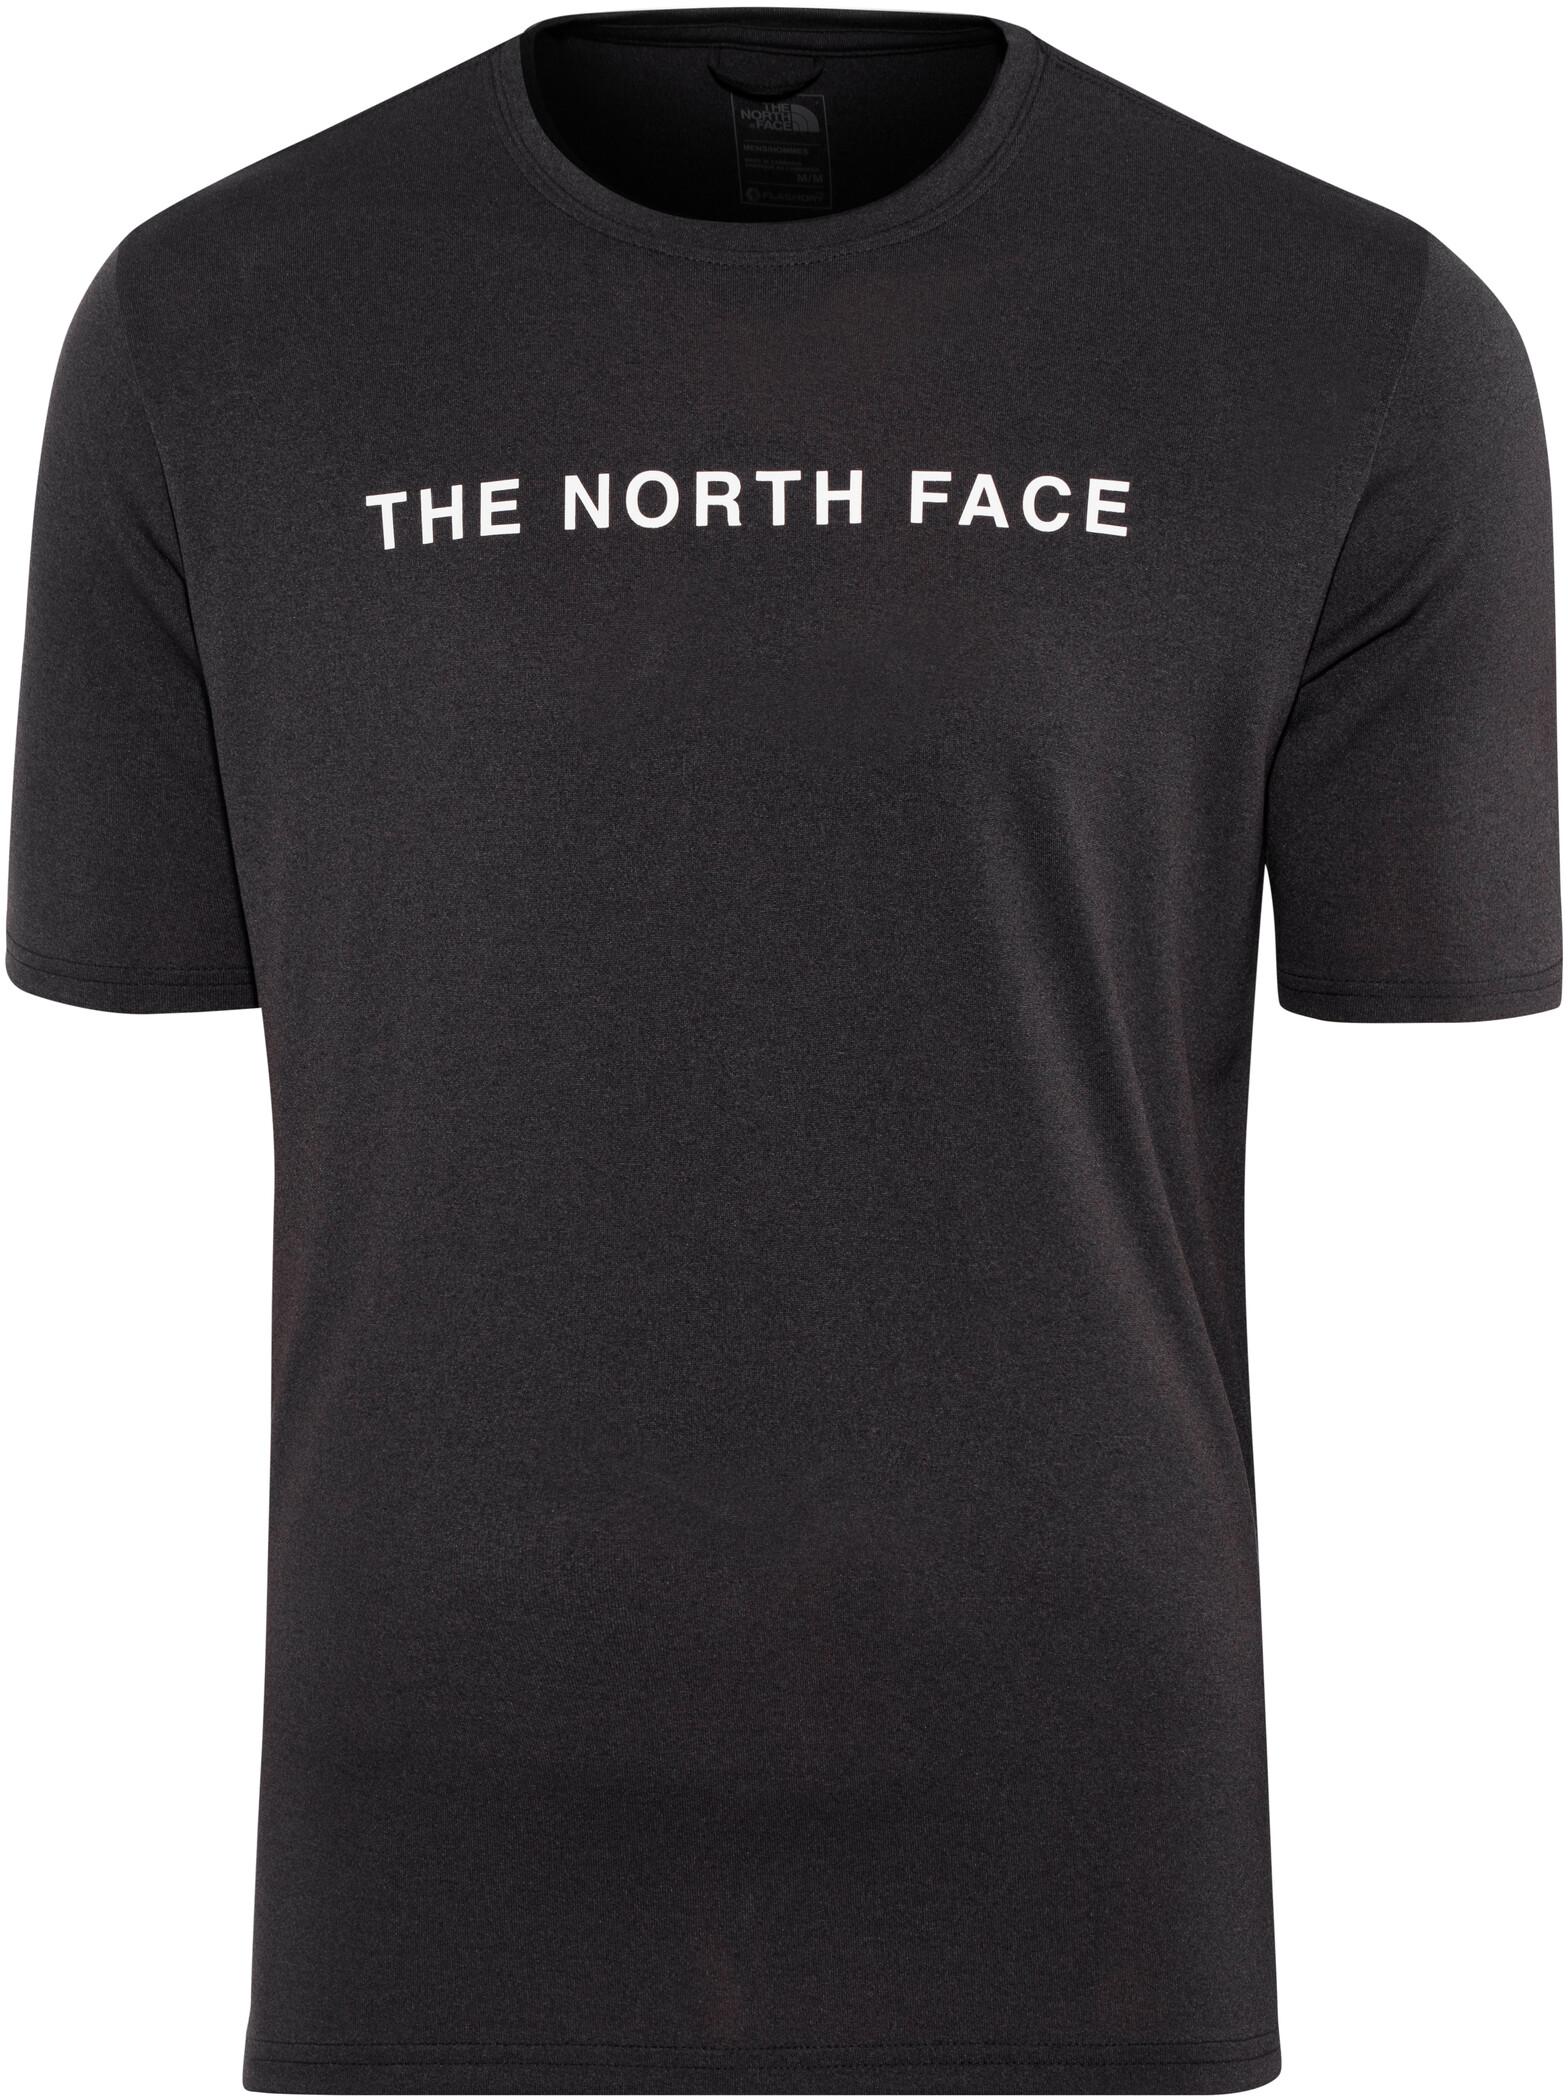 The North Face Train N Logo SS Tee Herrer, tnf black heather (2019) | Jerseys